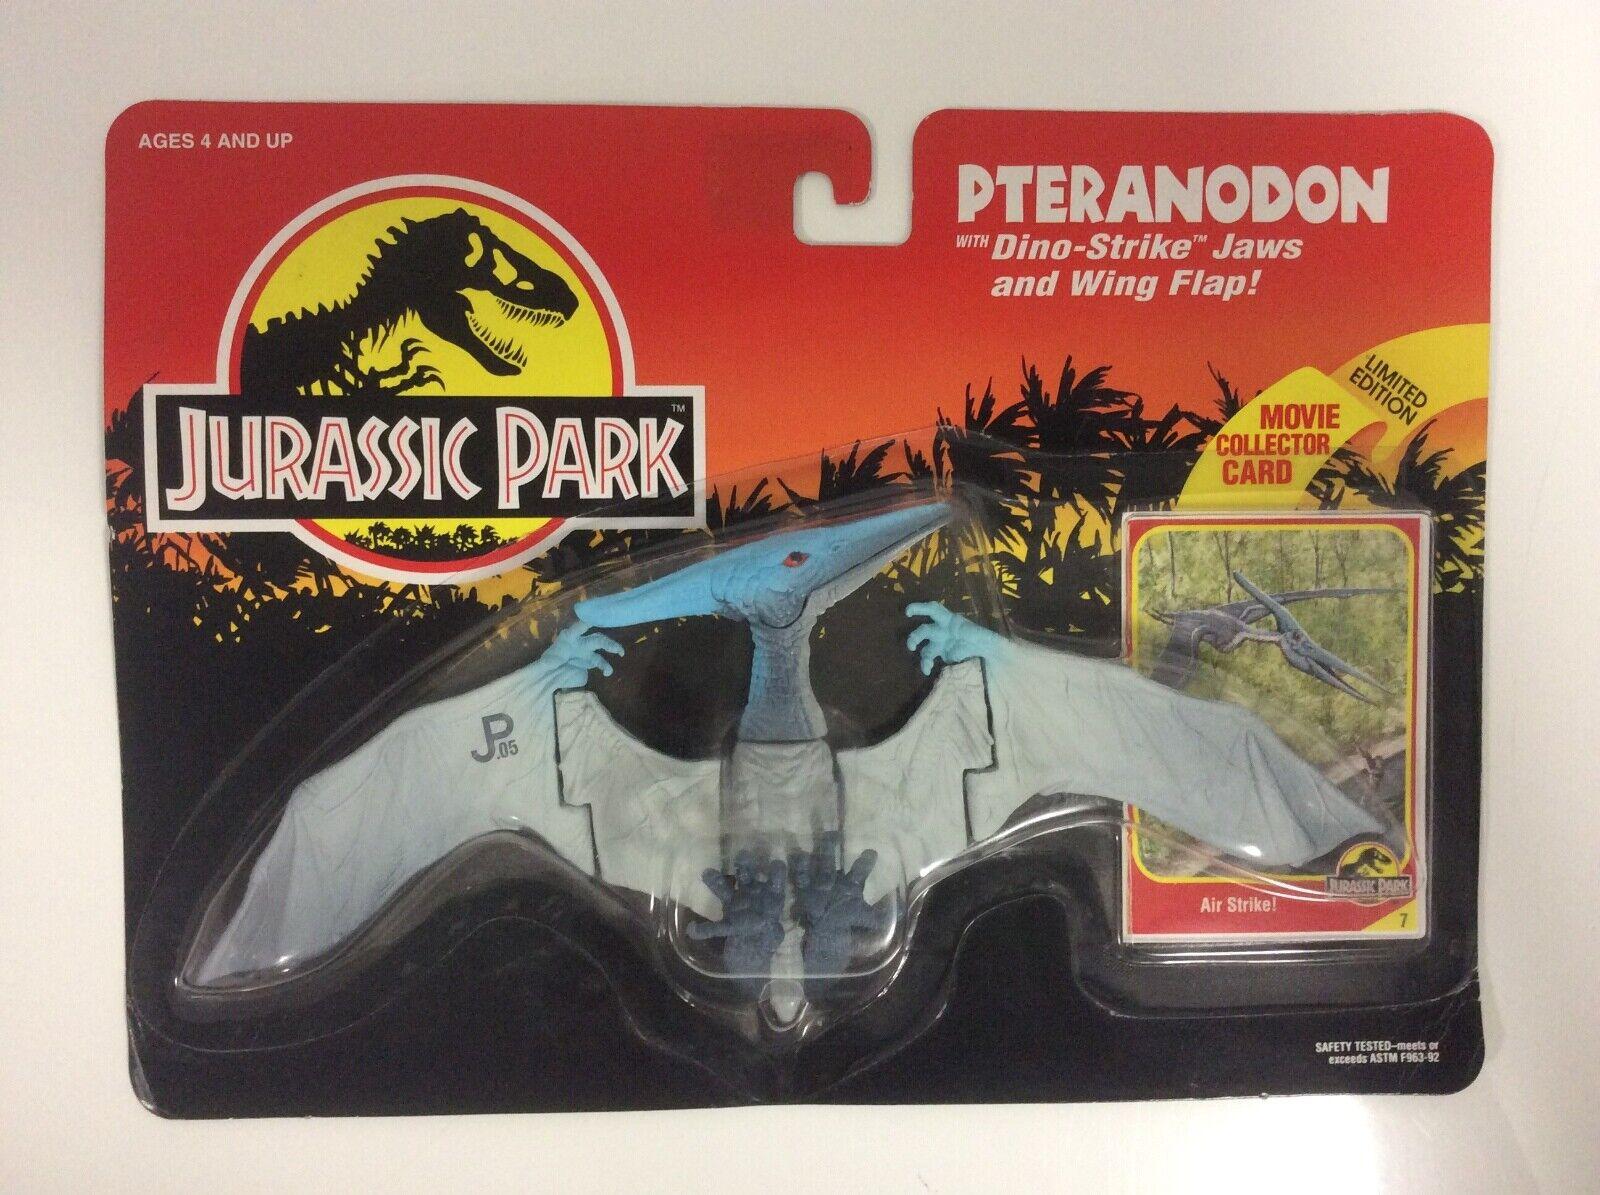 1993 Kenner Jurassic Park Dinosauri Figur - Pteranodon - MOSC